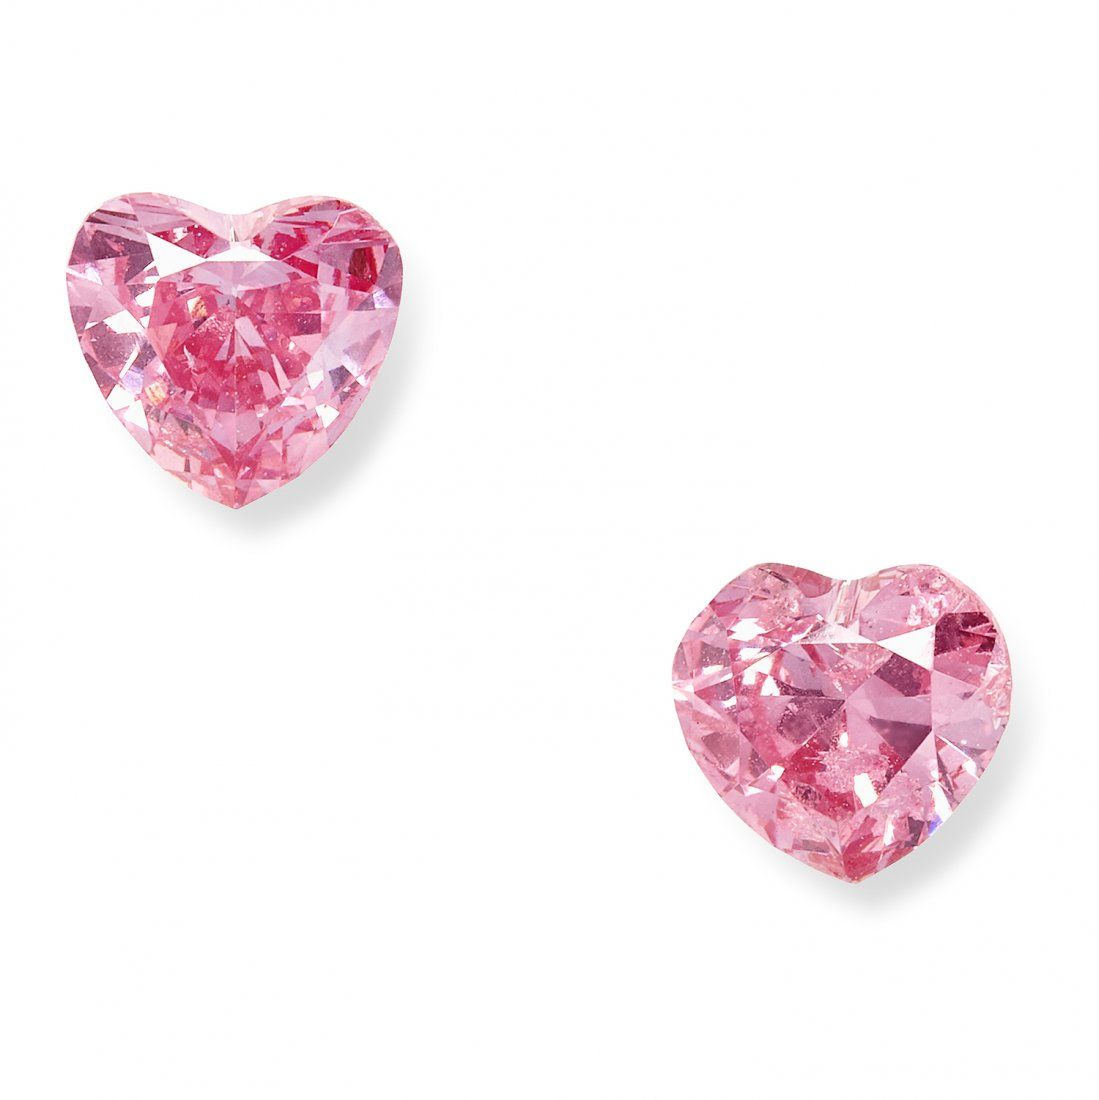 A PAIR OF 0.54 CARAT FANCY VIVID PURPLISH PINK DIAMOND